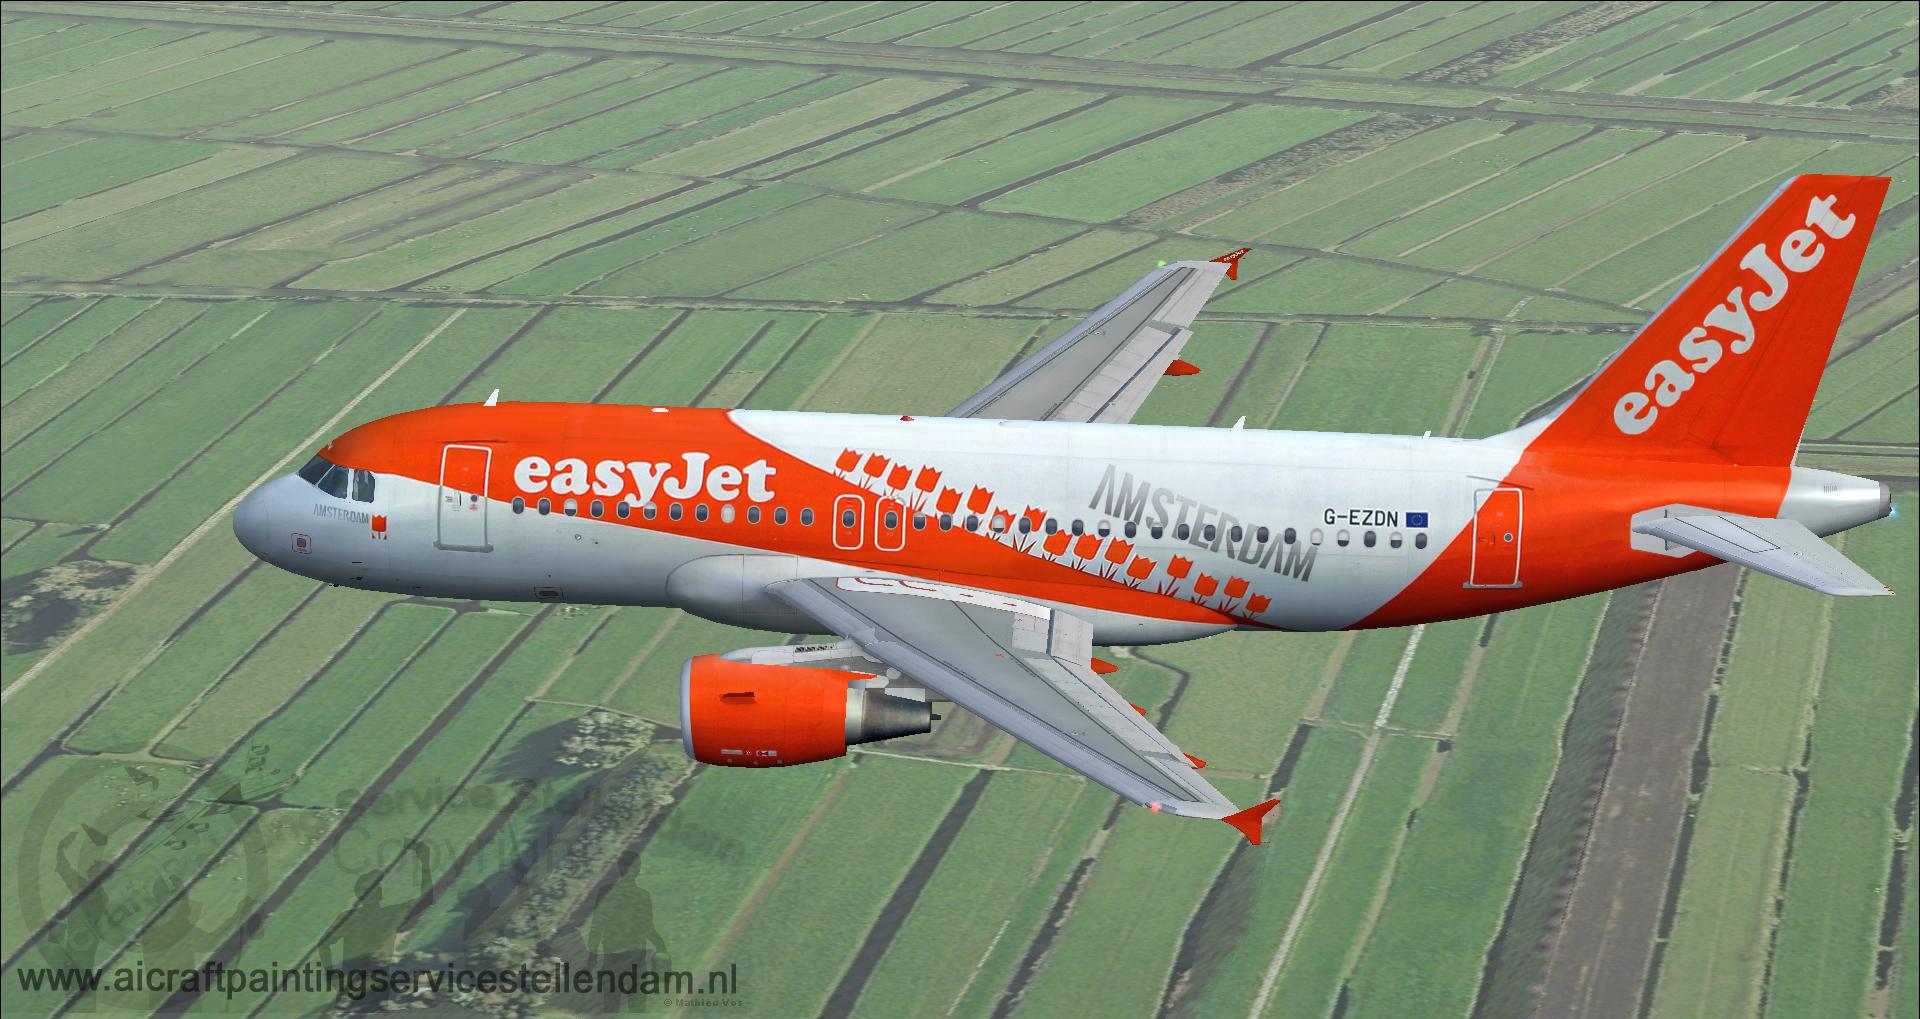 ProjectAirbusA319-111Easyjet_AmsterdamHub_G-EZDN5